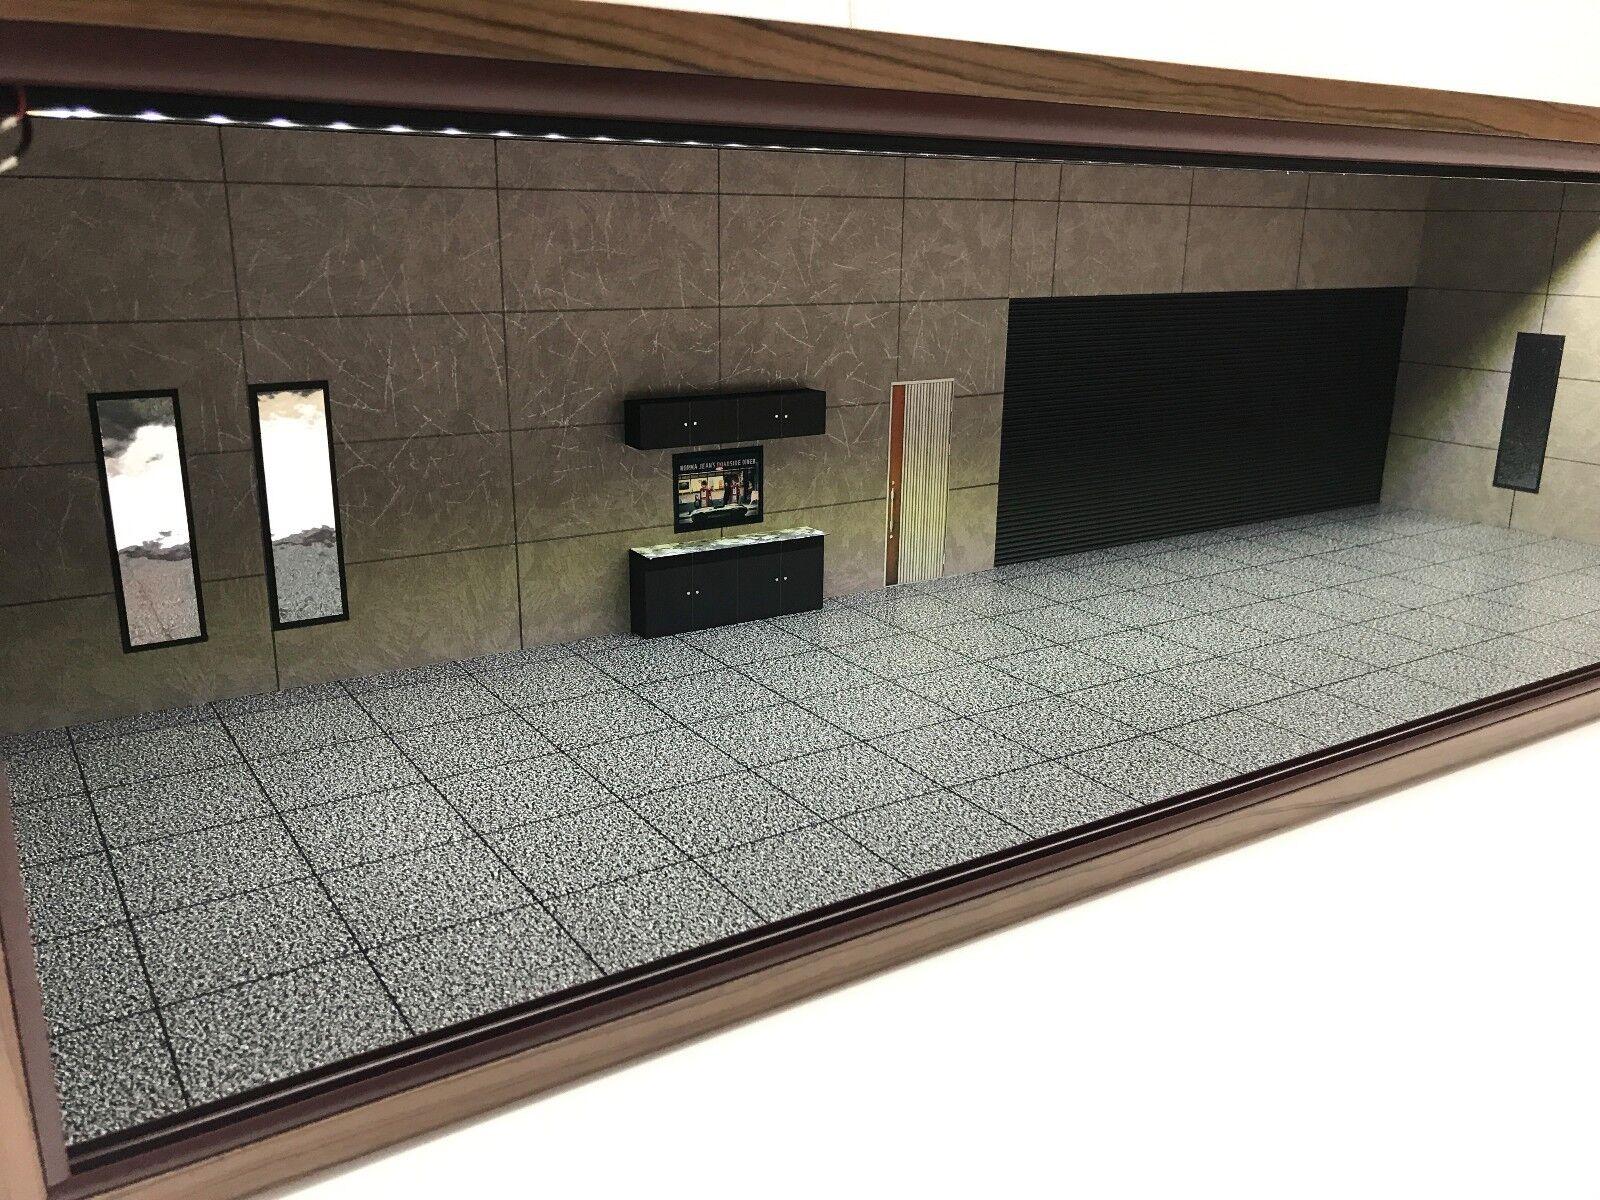 1 18 1 18 SCALE DIORAMA GARAGE DISPLAY DISPLAY DISPLAY ACRYLIC CASE W  LED LIGHT MADE IN JAPAN ③ 34c884